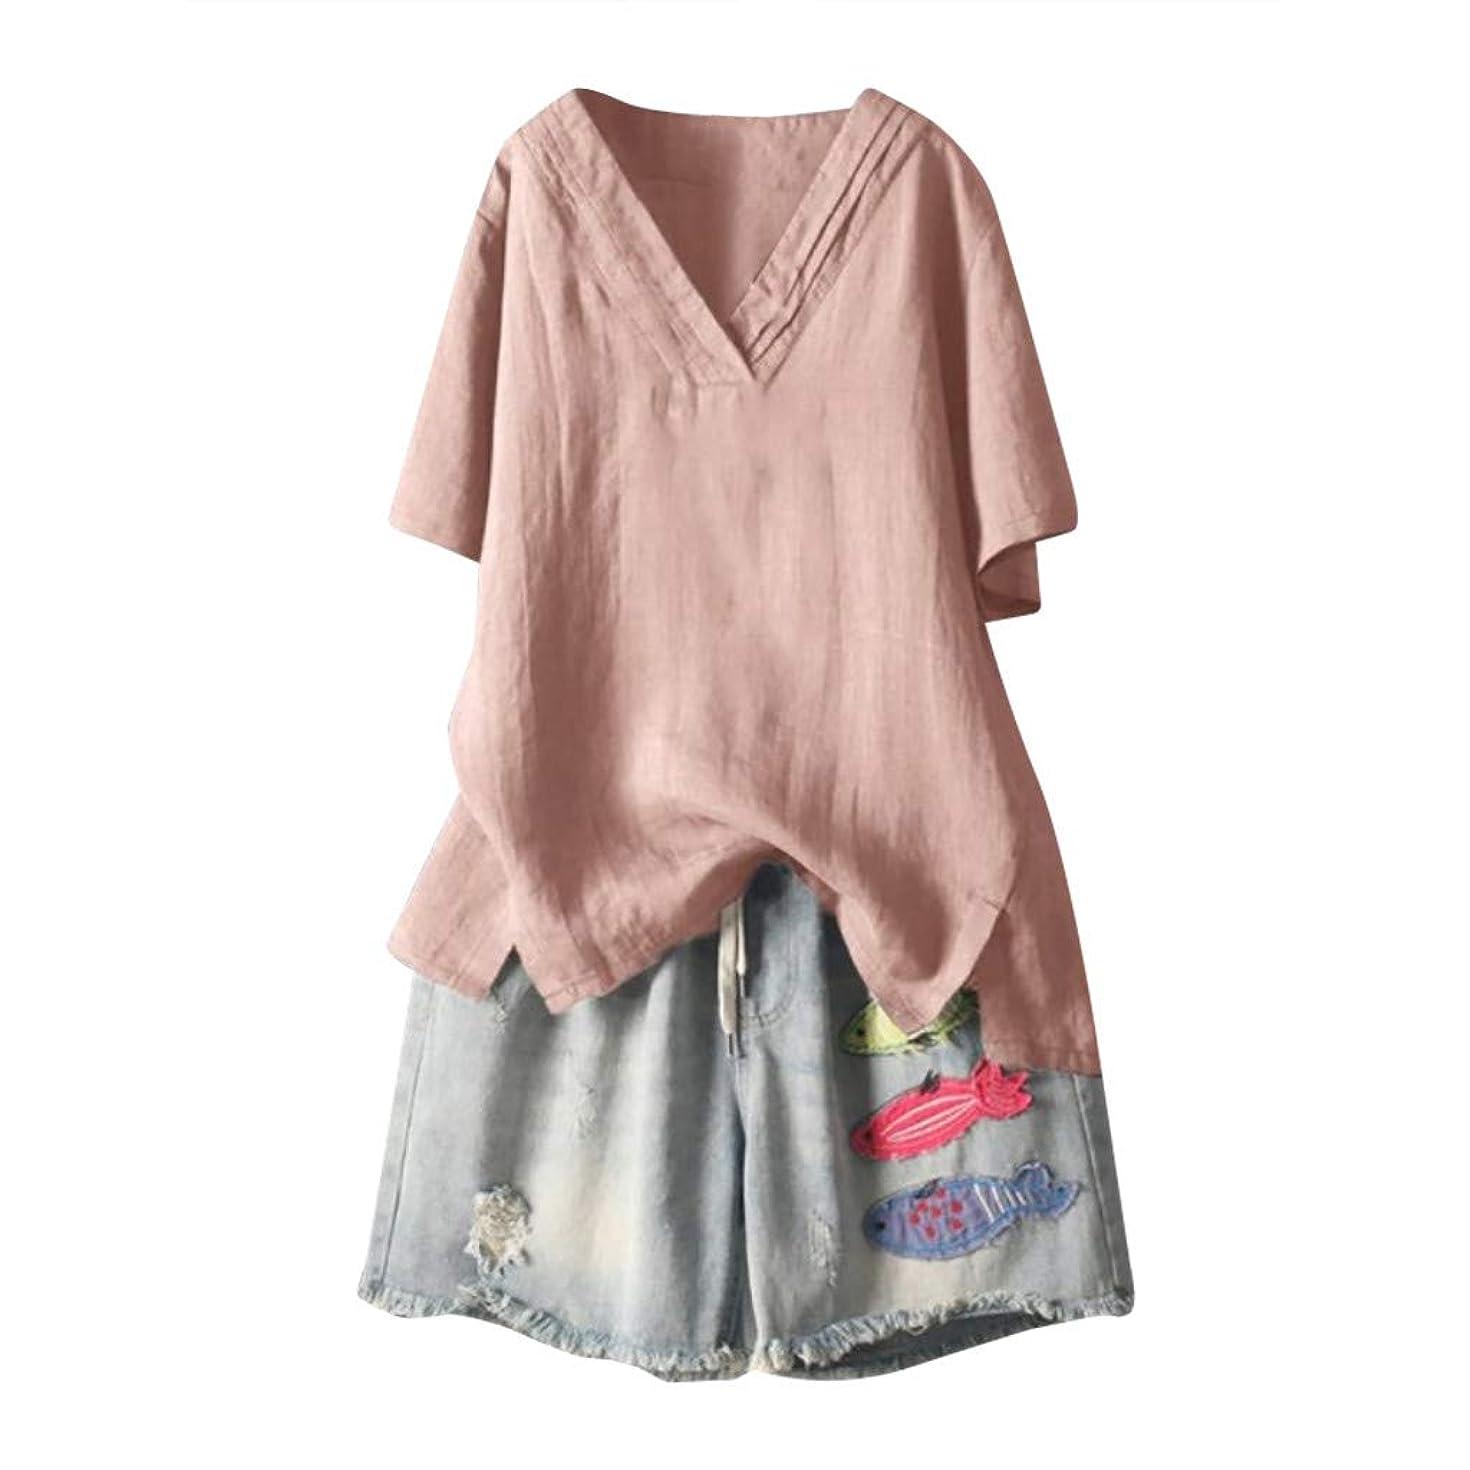 Cewtolkar Women Summer Blouse Plus Size Shirt Cotton and Linen Tops V Neck Tunic Short Sleeve Tees Casual T Shirt